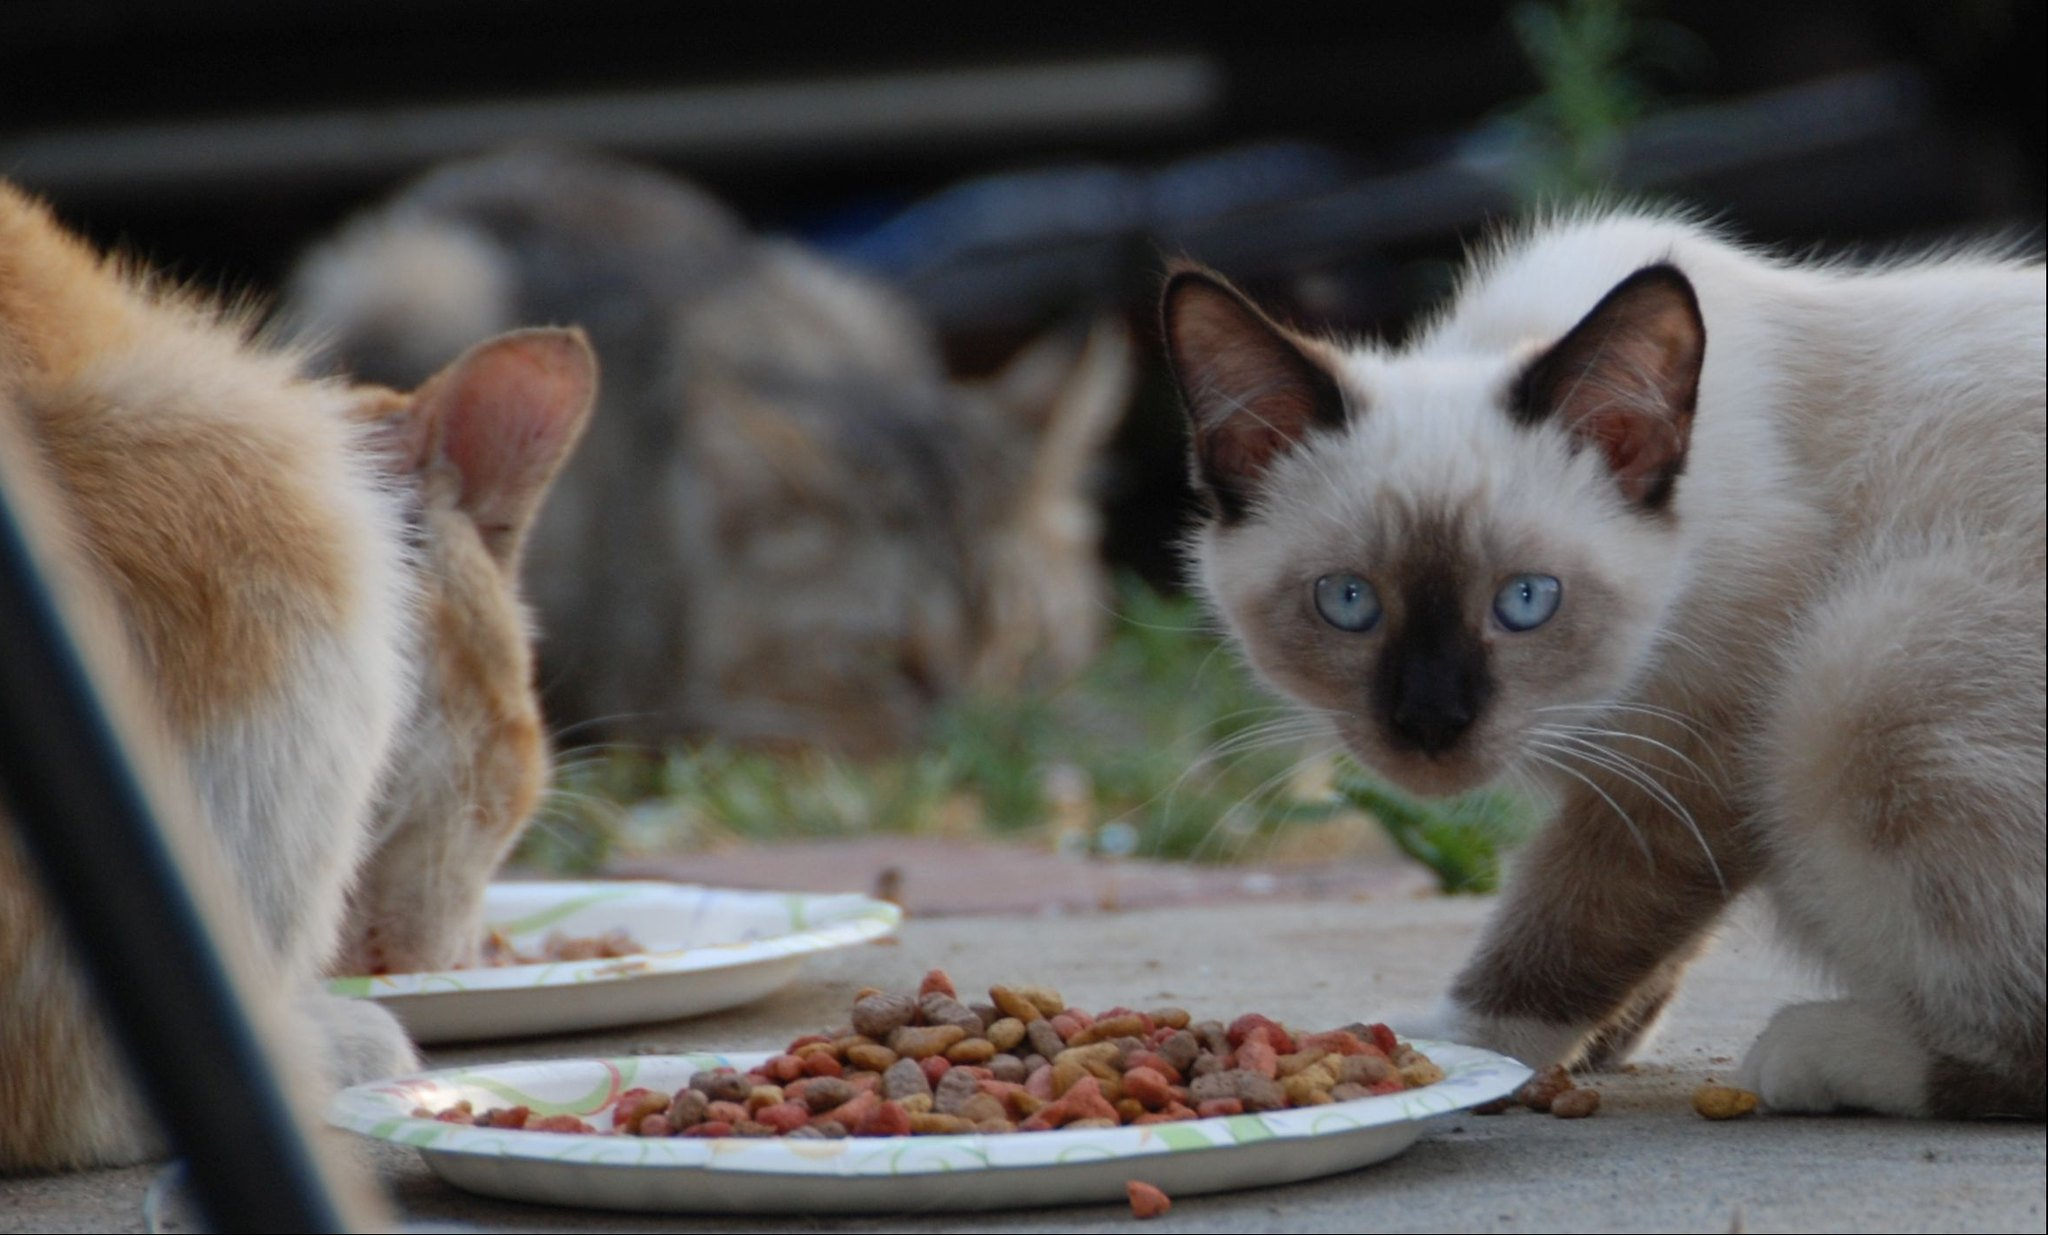 Gatos alimentándose | Imagen: Flickr